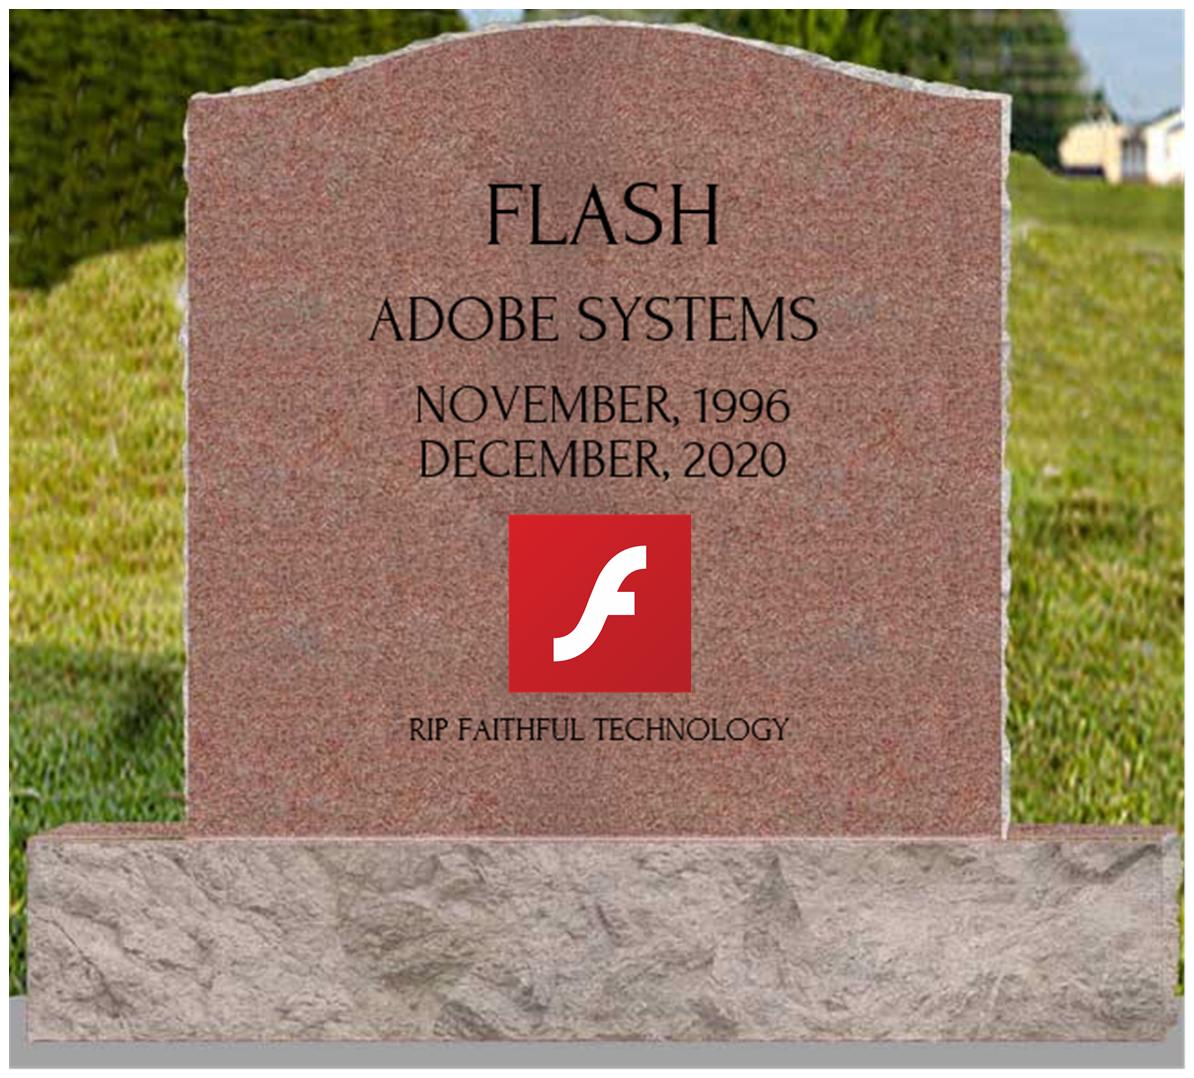 Am I Next? Adobe Flash End of Life 2020